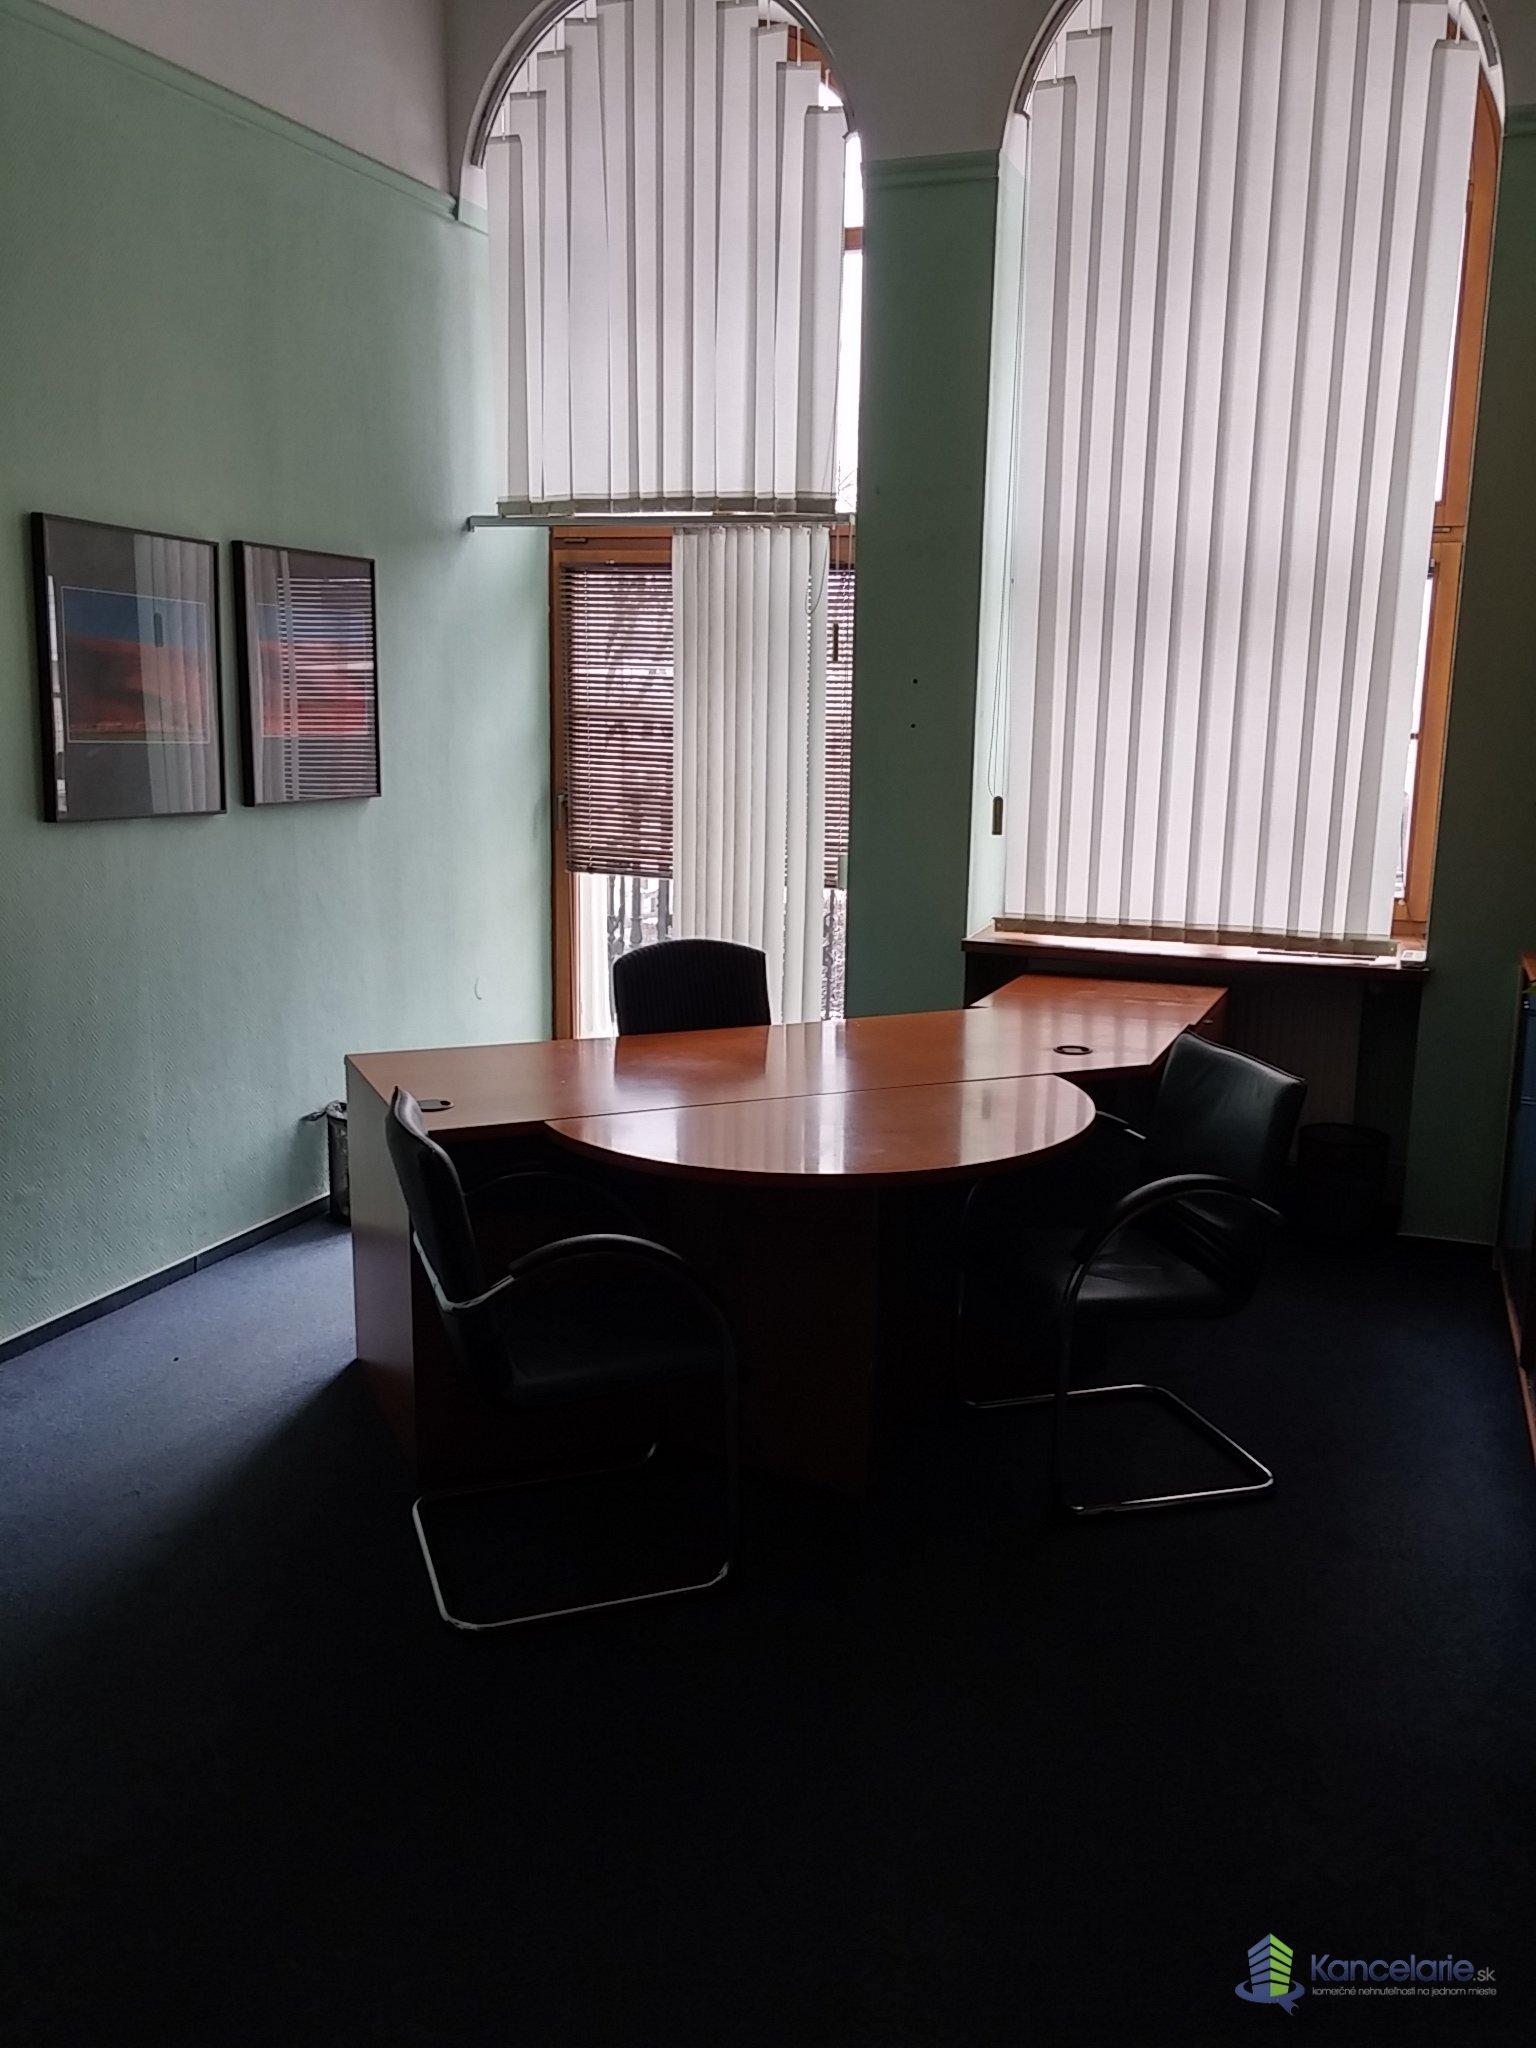 AB Allianz - Slovenská poisťovňa, a.s., Kancelária č. 204, Hlavné námestie 22/1, Rimavská Sobota